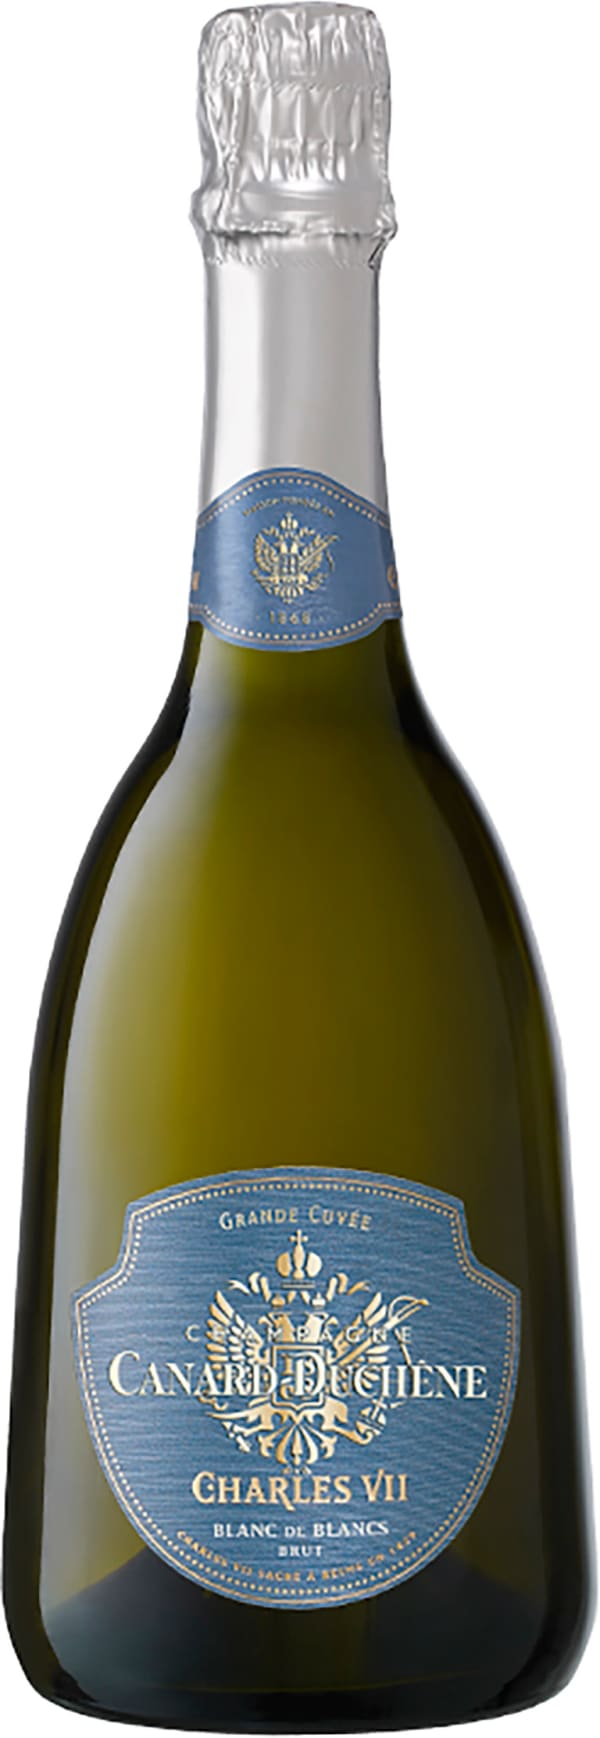 Canard-Duchêne Charles VII Blanc de Blancs Champagne Brut